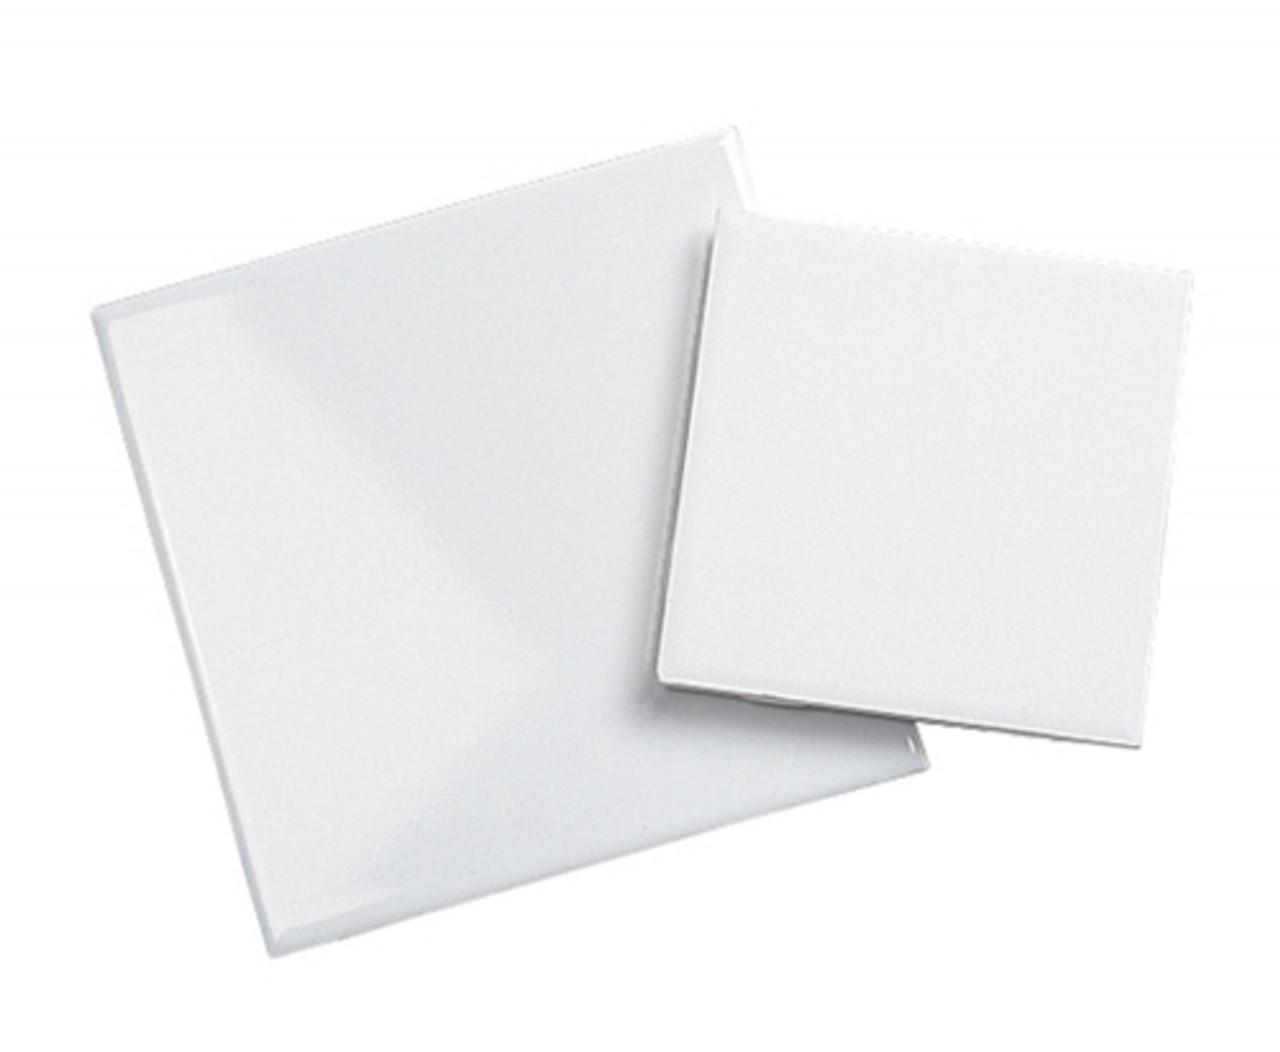 "6"" x 6"" White Bisque Tile - each"